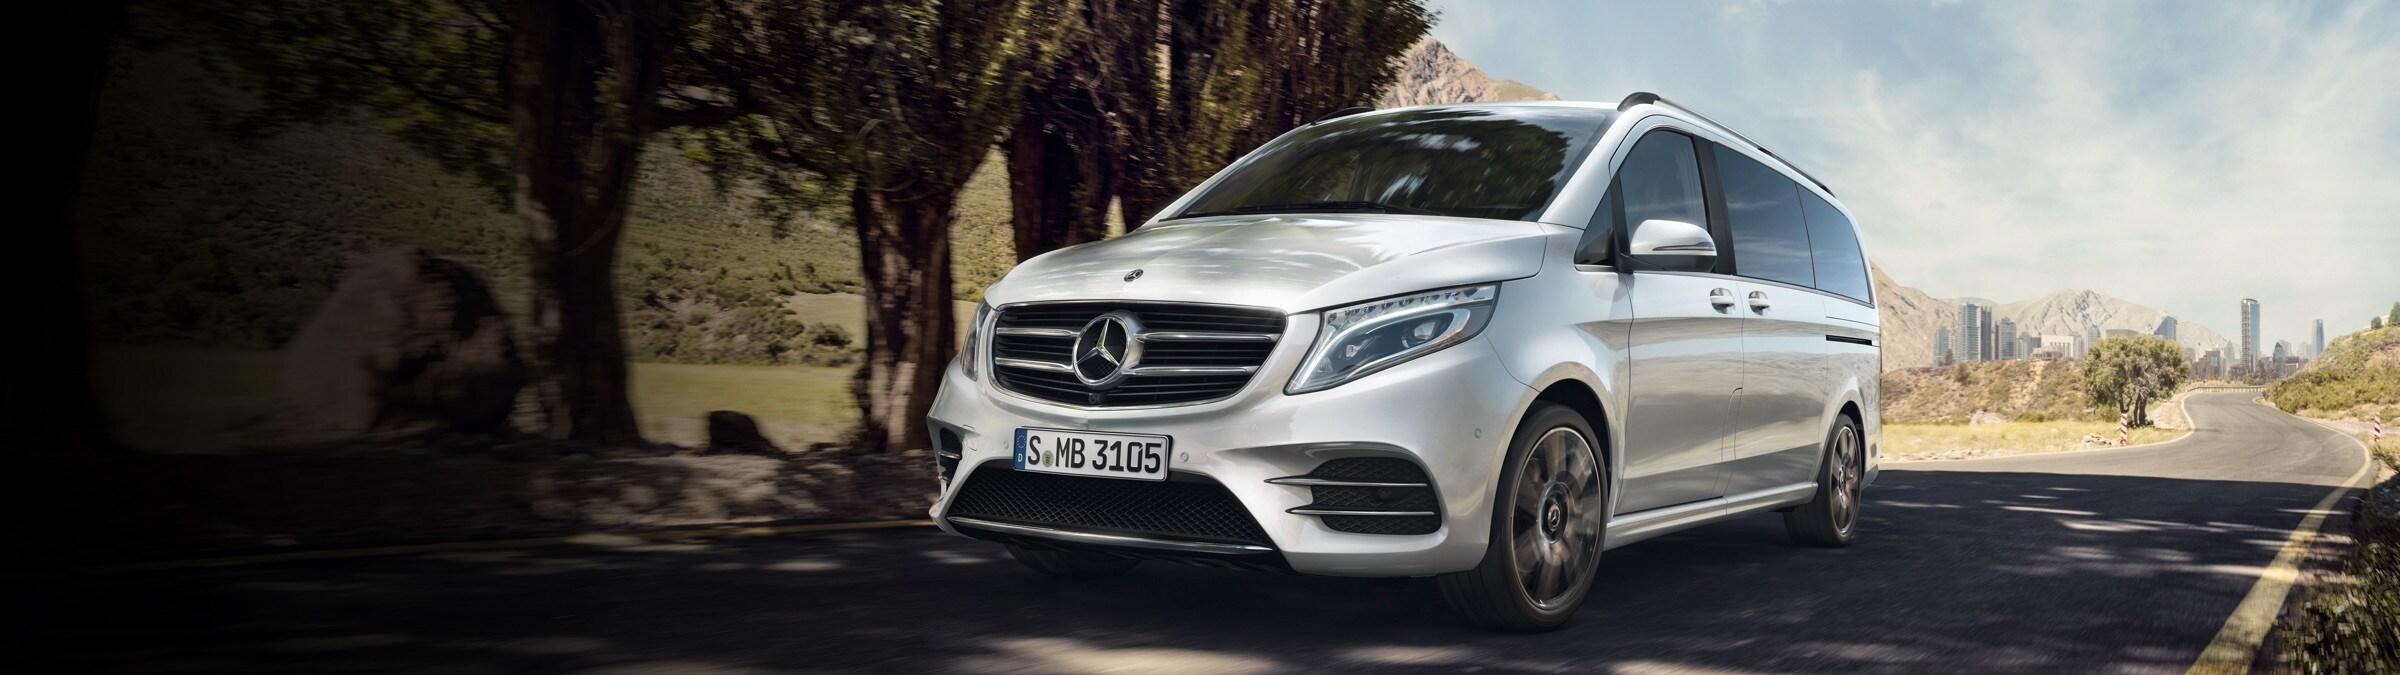 Incredibles 2 | Mercedes-Benz